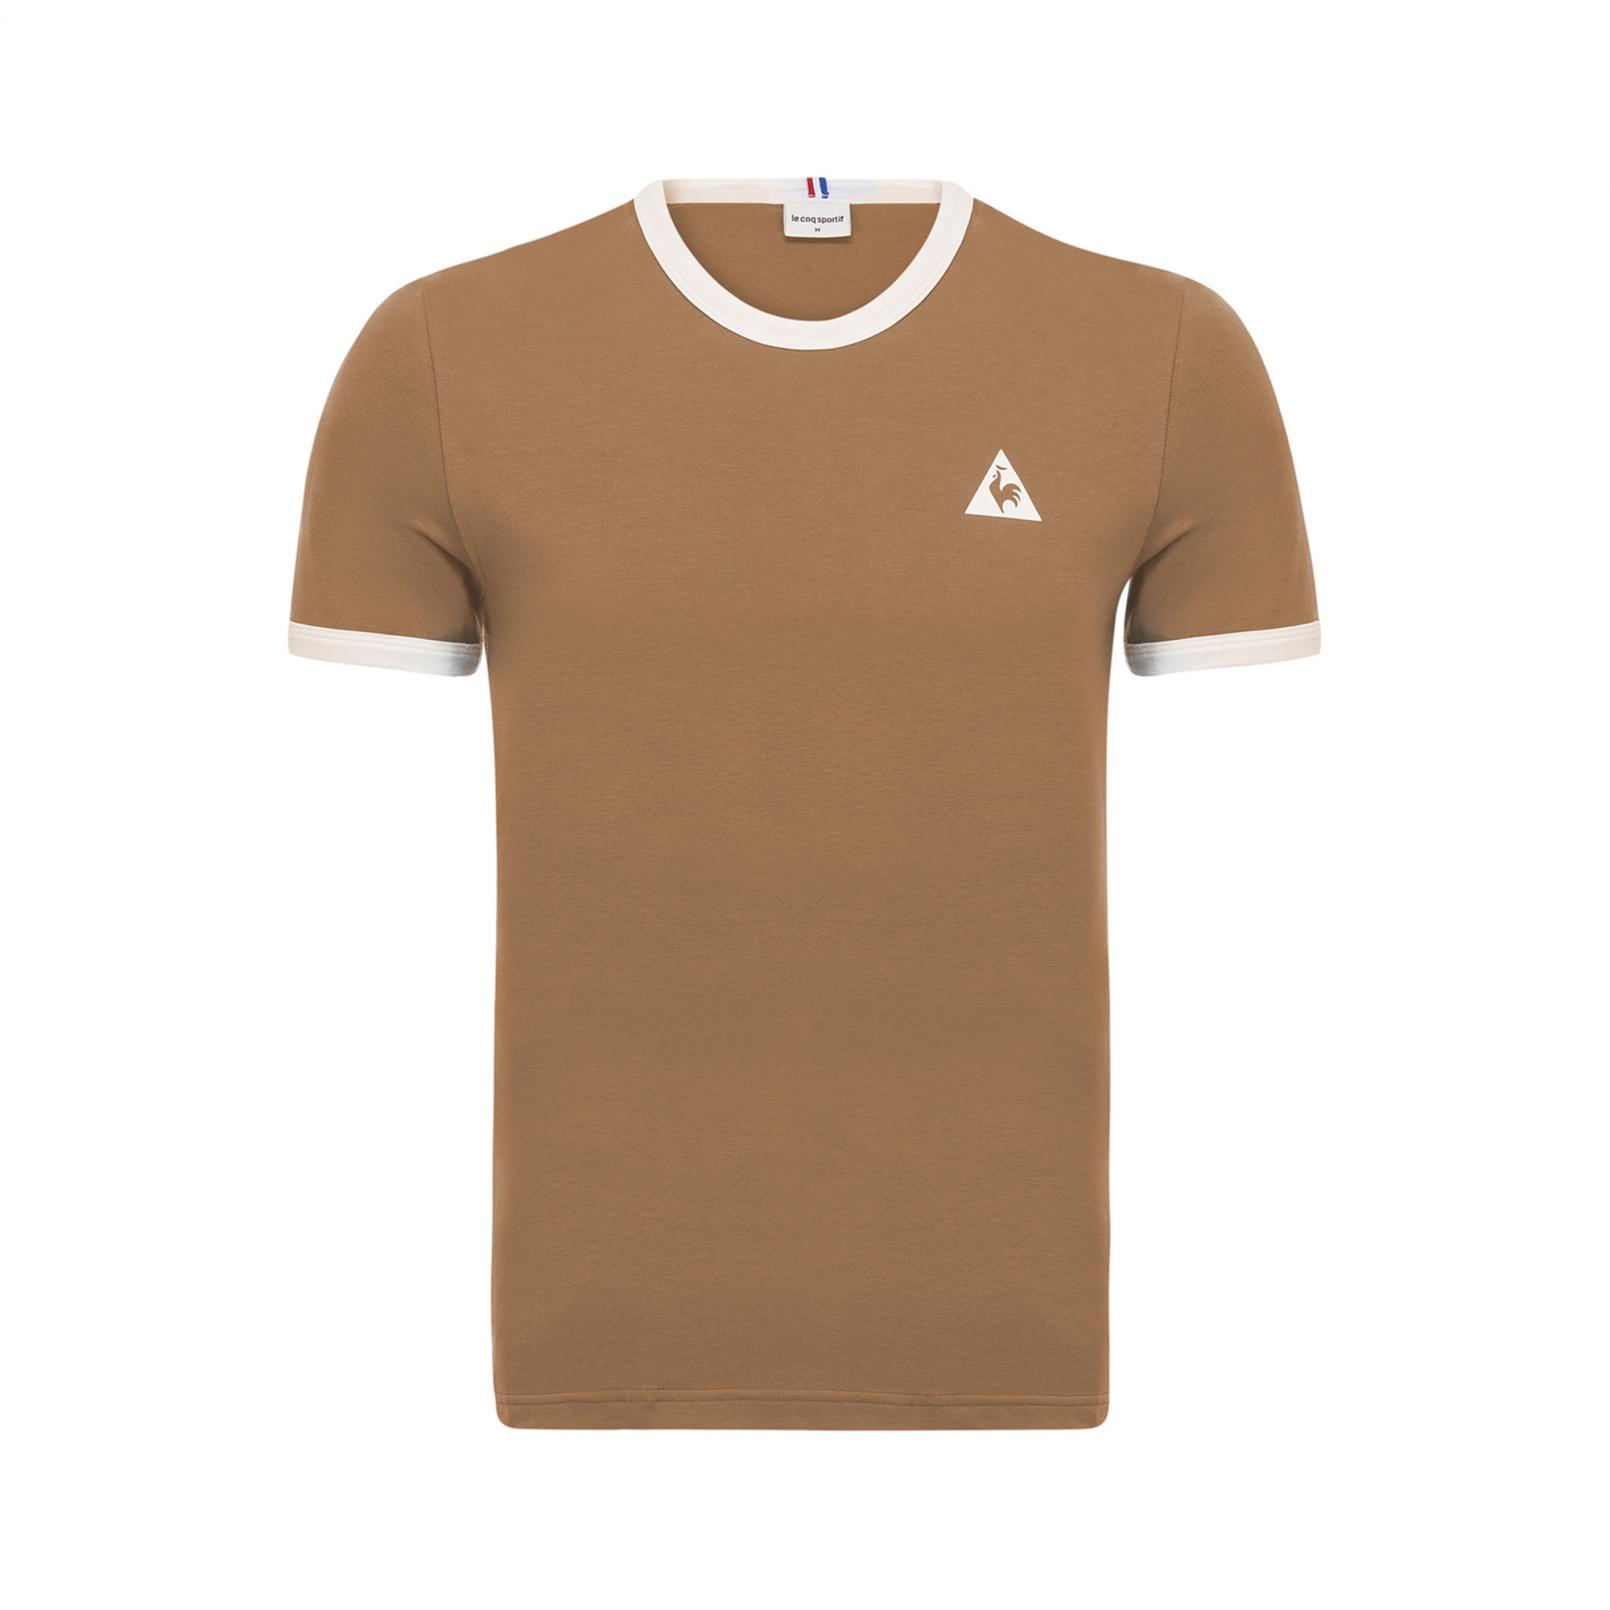 T-shirts – Le Coq Sportif Essentiels T-shirt Multicolored